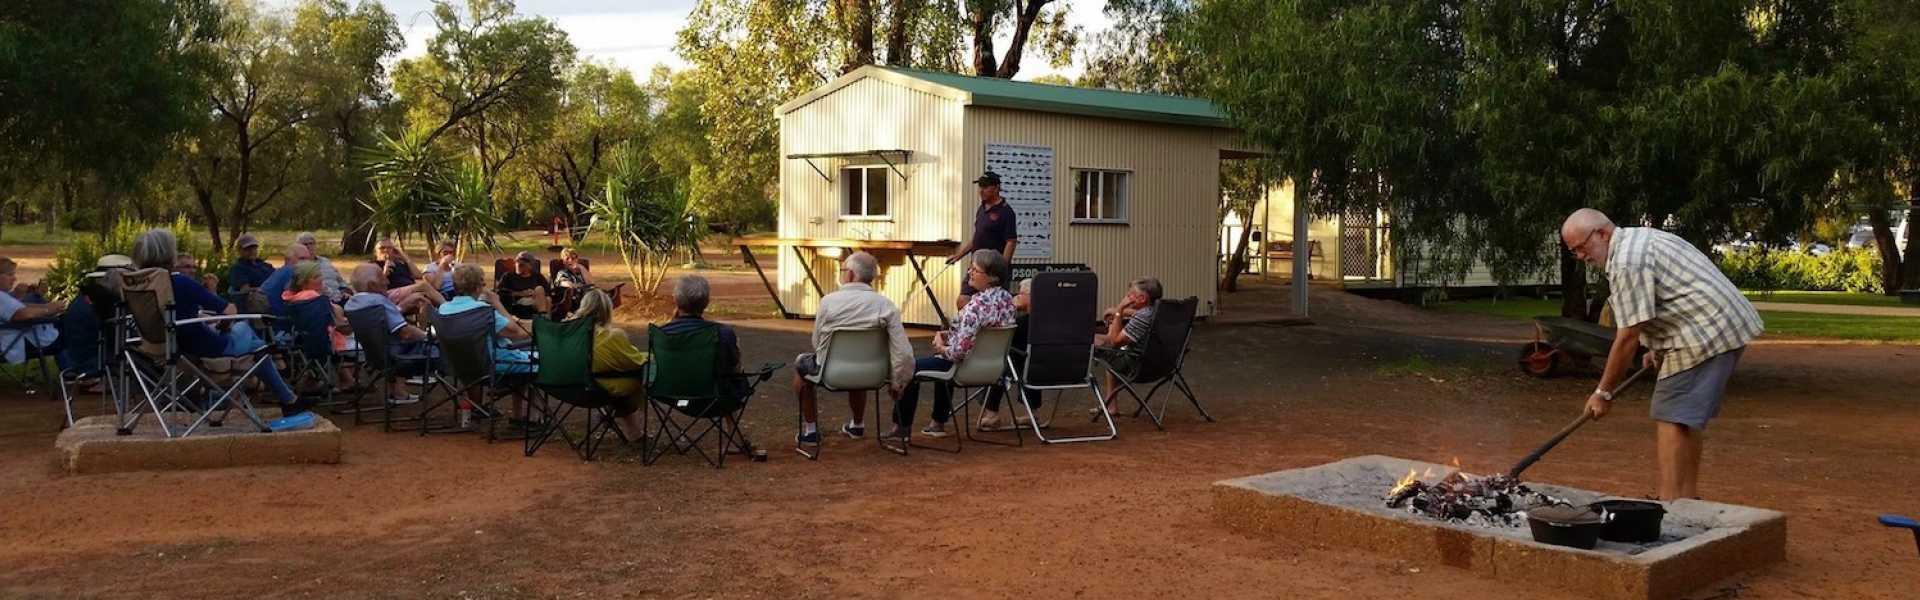 Kui Parks, Charleville Caravan Park, Happy Hour